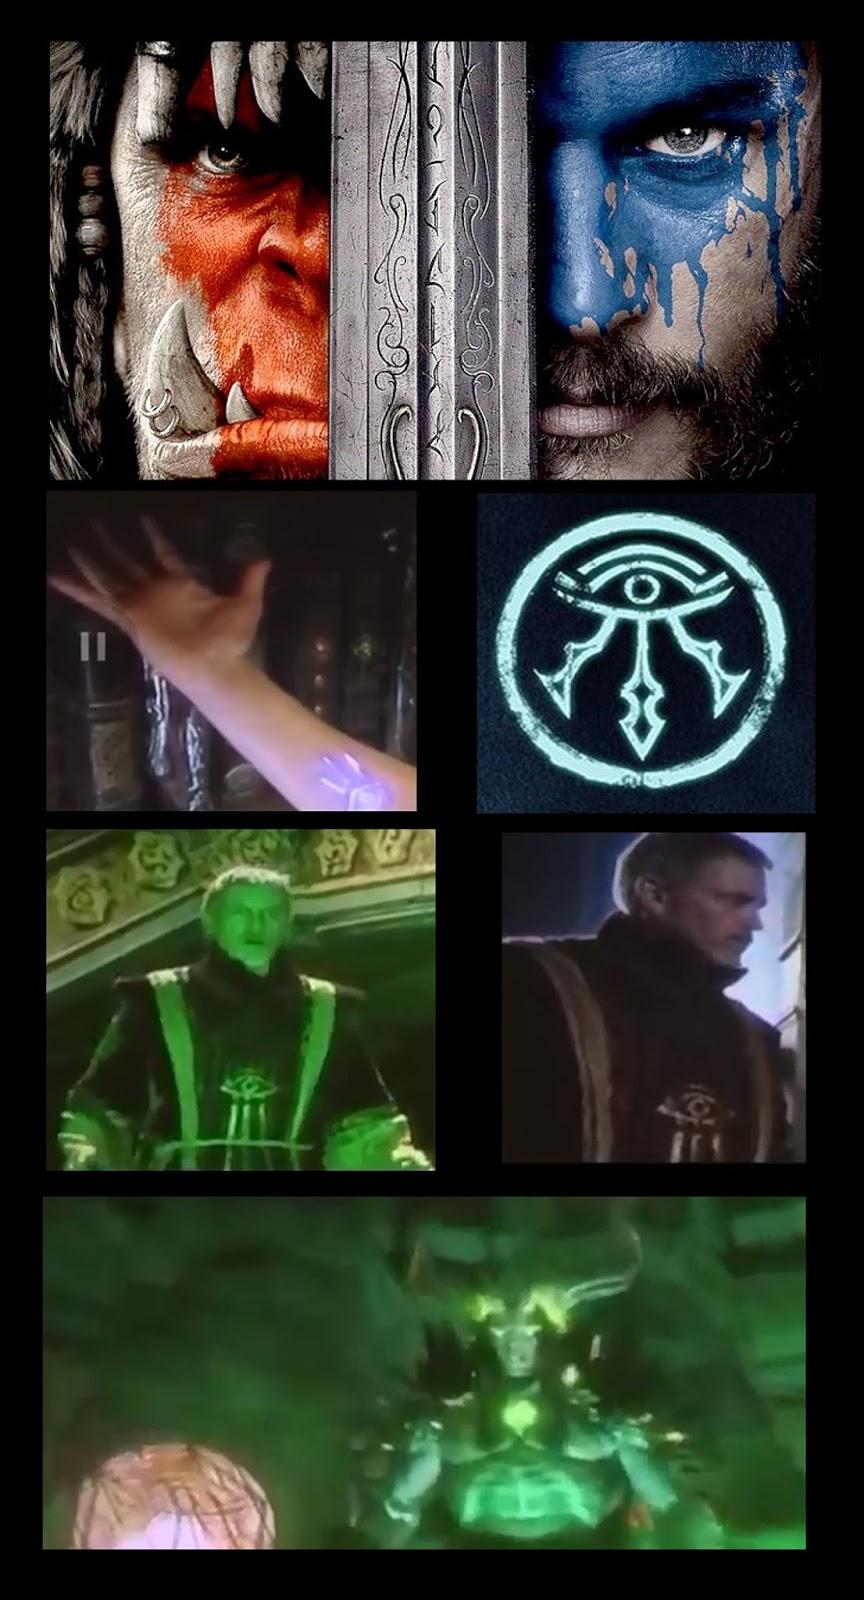 One all seeing eye symbolism in warcraft movie true freethinker one all seeing eye symbolism in warcraft movie biocorpaavc